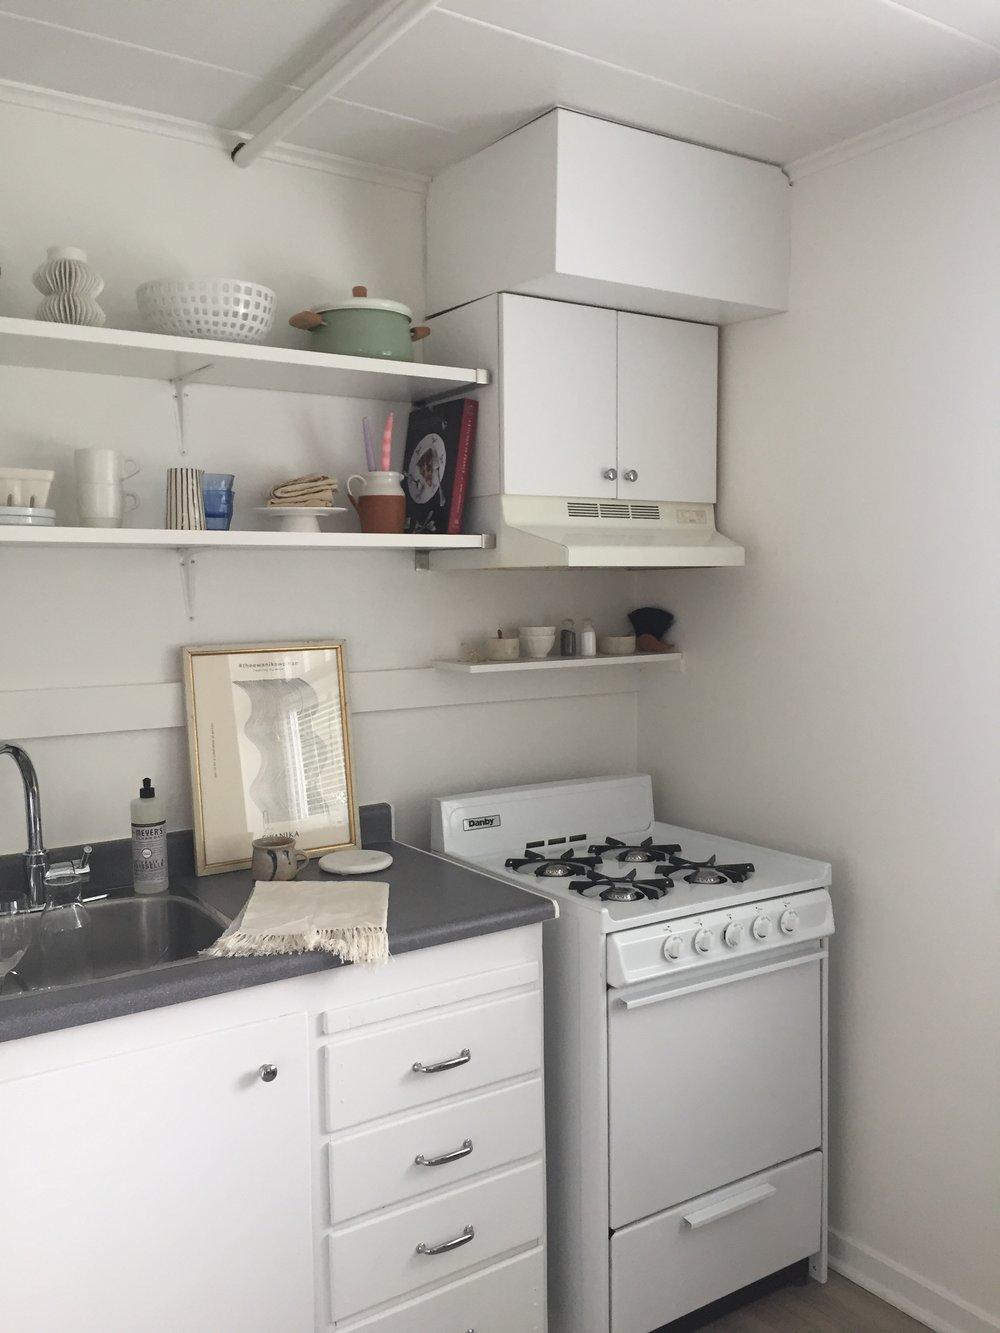 KendraMurphy-Kitchen-Before1.JPG